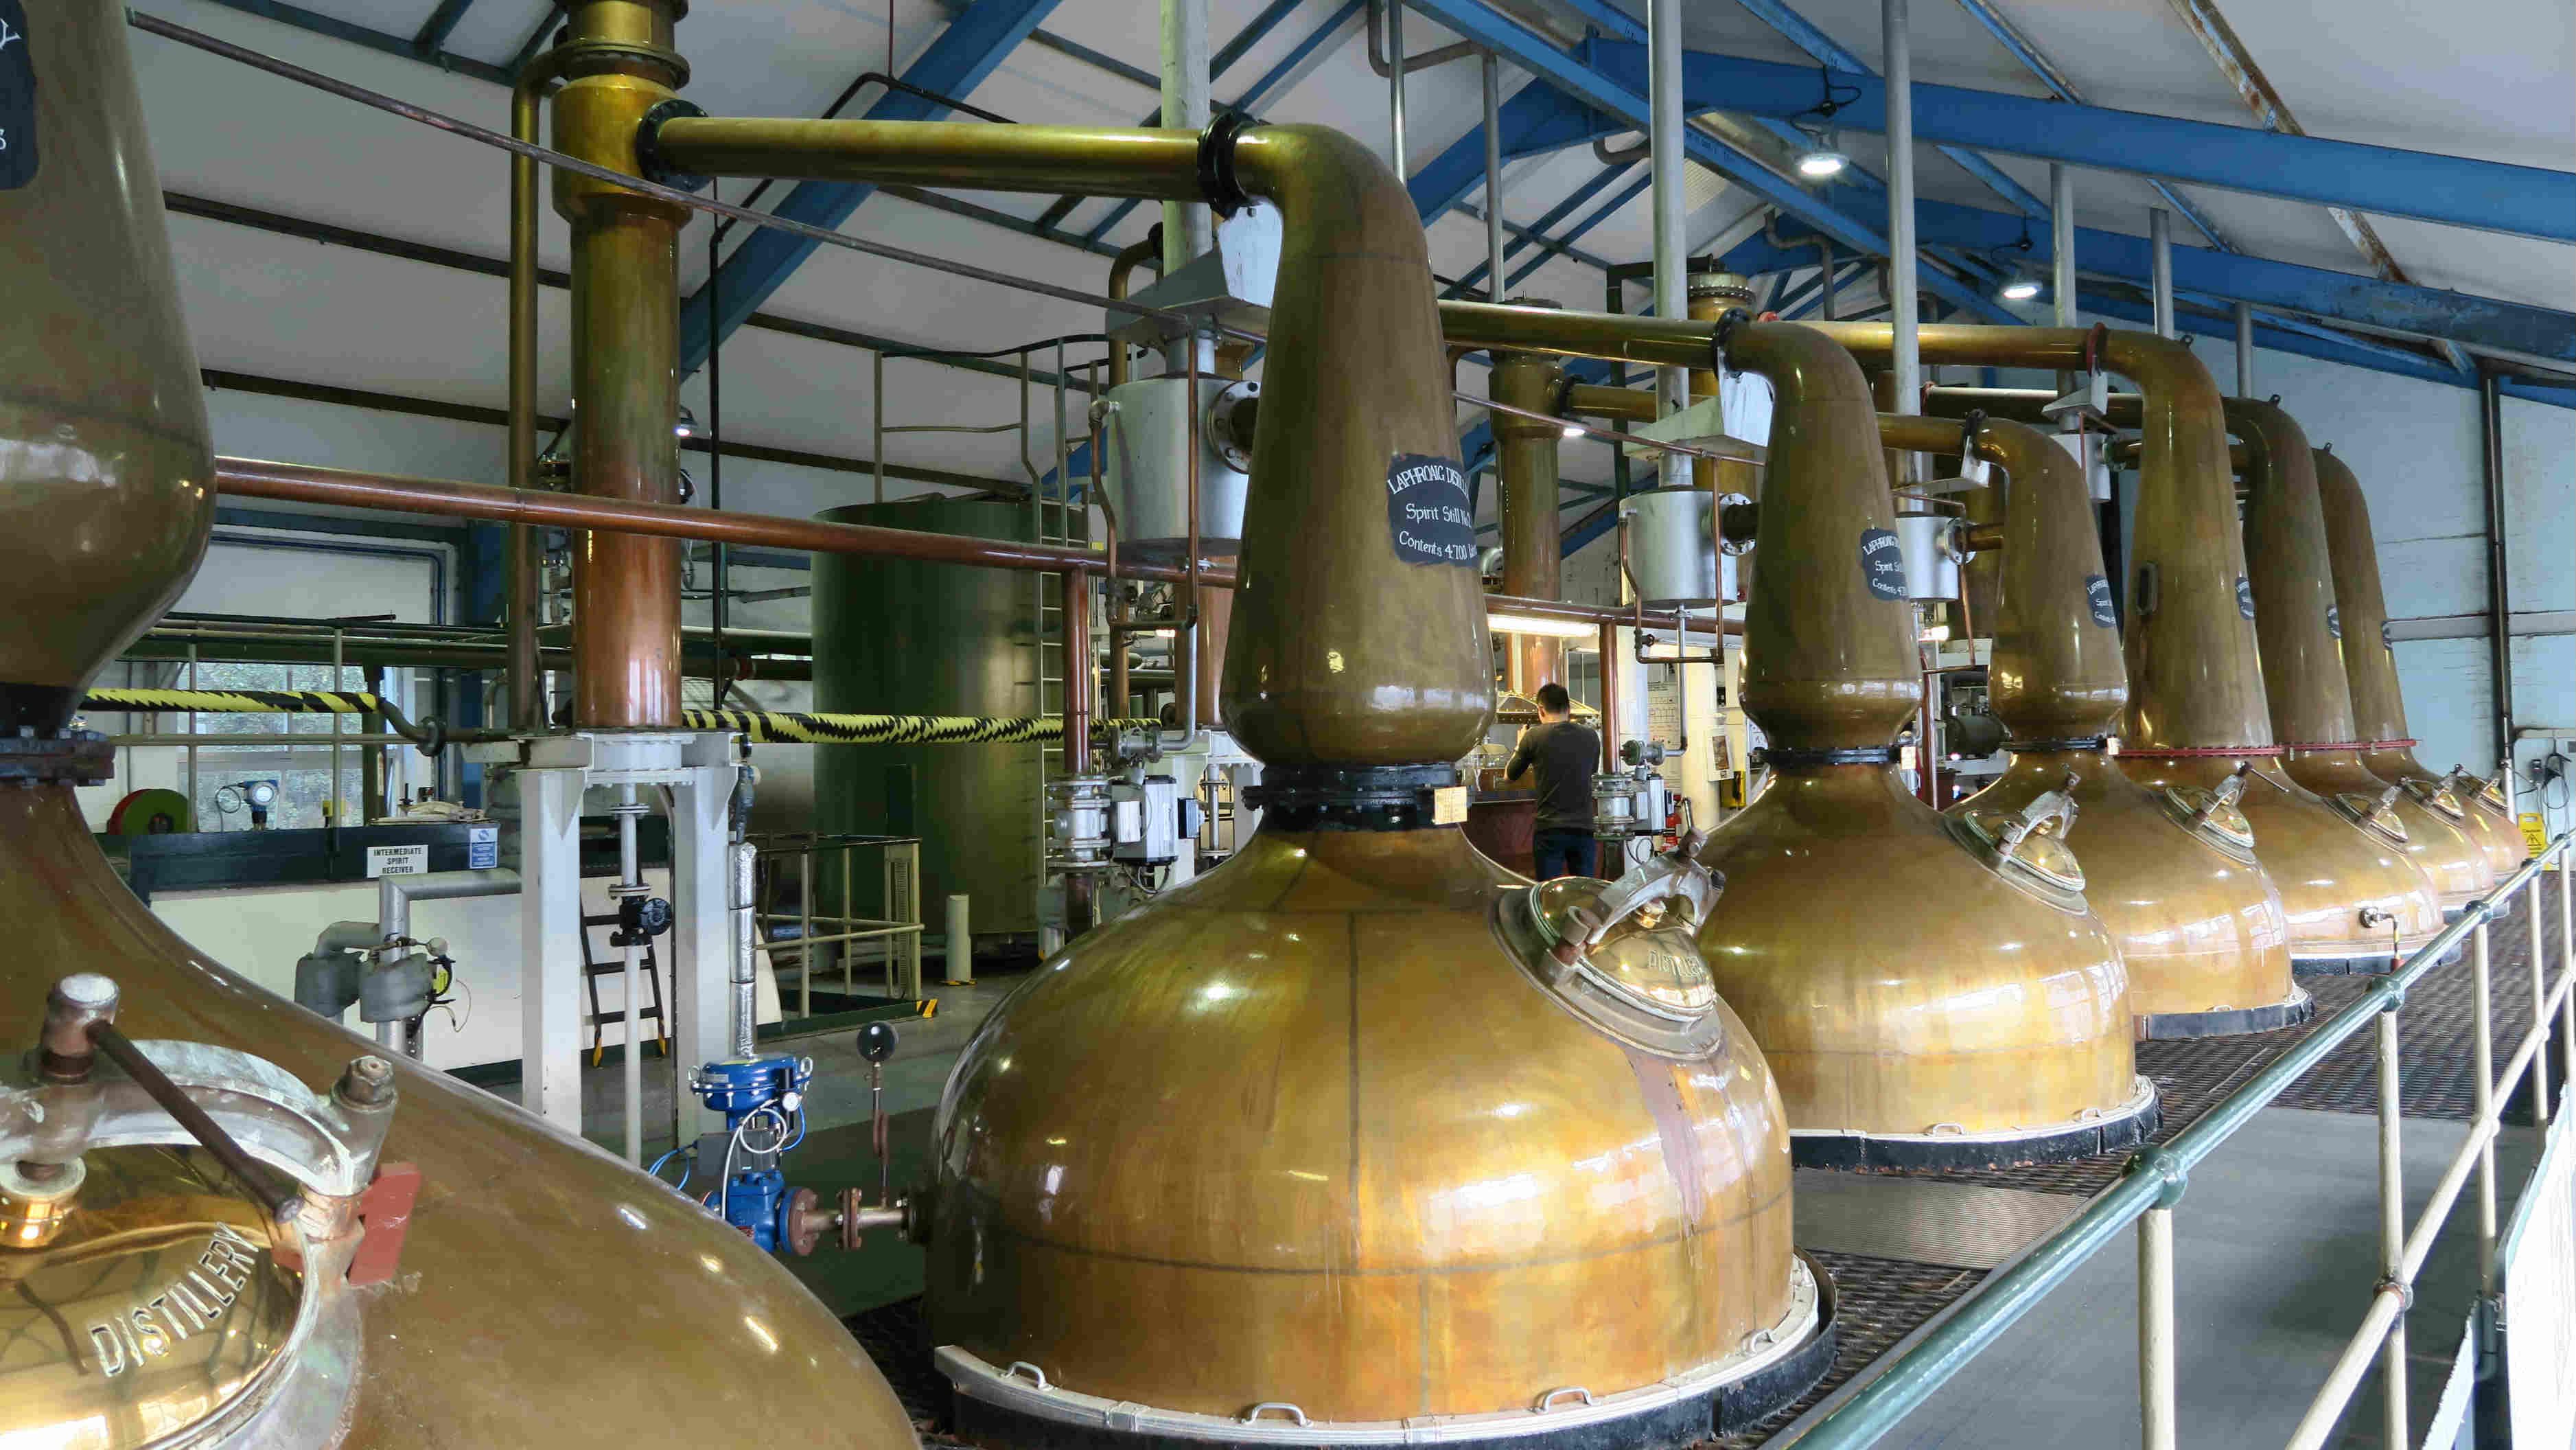 Laphroaig 的 7 個蒸餾器,前面的是 Spirit Still(負責第二次蒸餾),後面是 Wash Still(負責第一次蒸餾)。